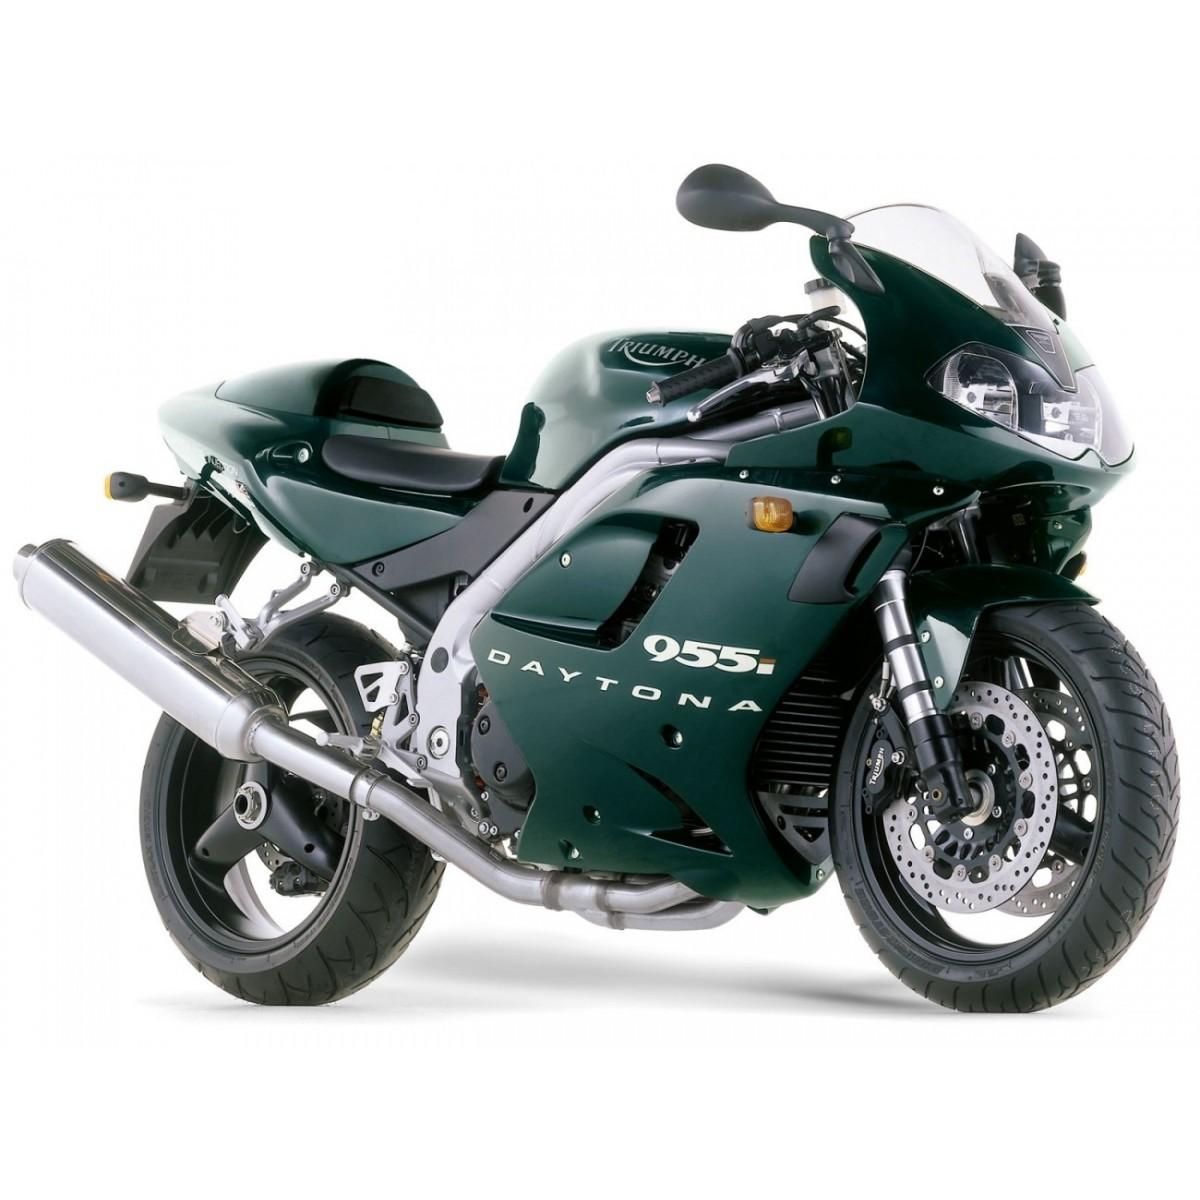 Kit Adesivos Triumph Daytona 955i Verde D955004 Decalx